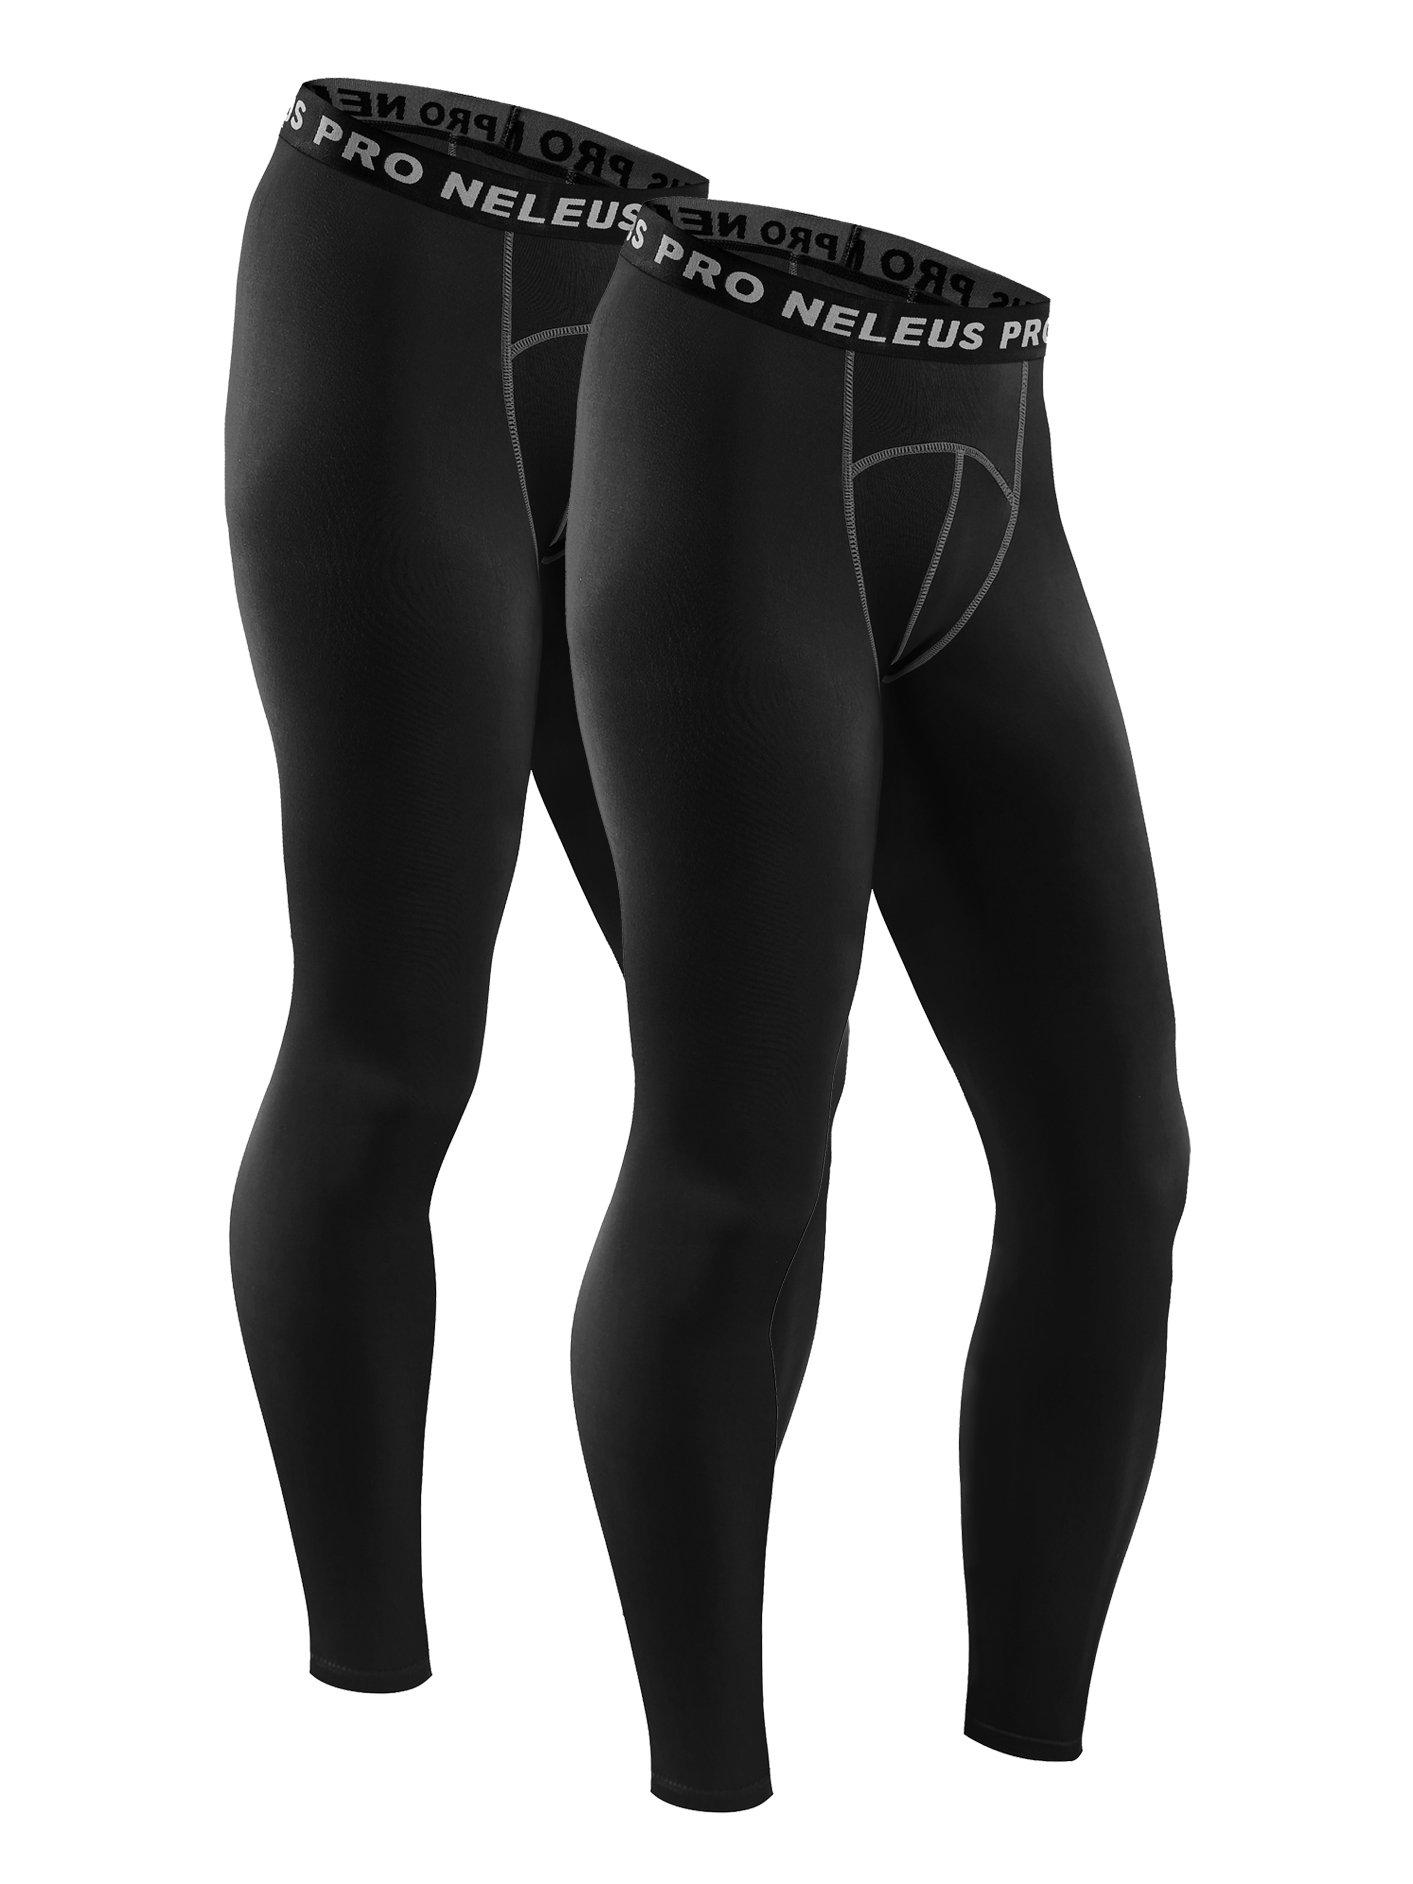 Neleus Men's 2 Pack Compression Tights Sport Running Leggings Pants,6026,Black,S,EUR M